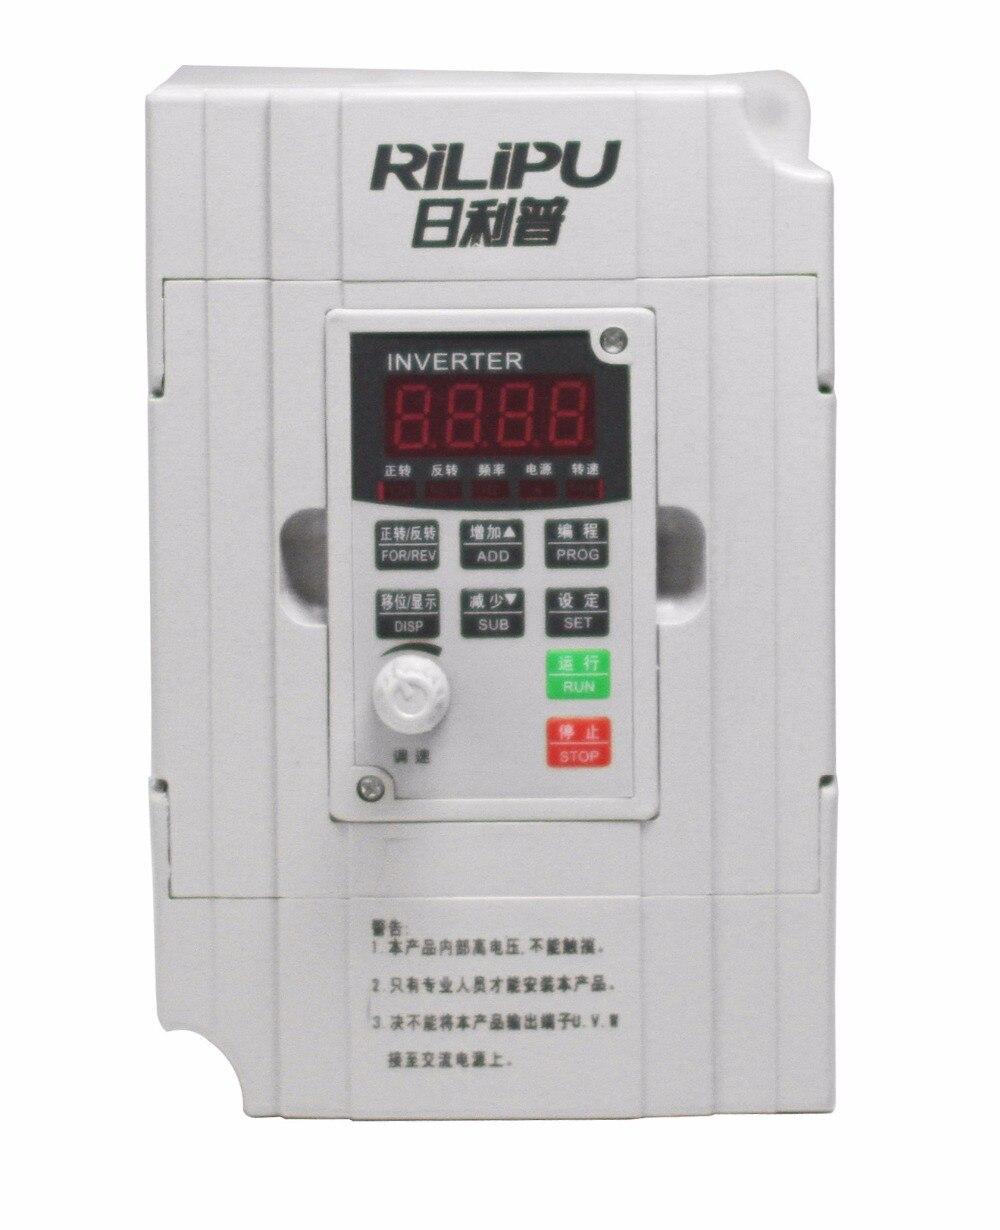 Convertidor de frecuencia VFD inversor RiLiPu 220v 1,5 kW Salida de uso común 3 fases 220v envío gratis